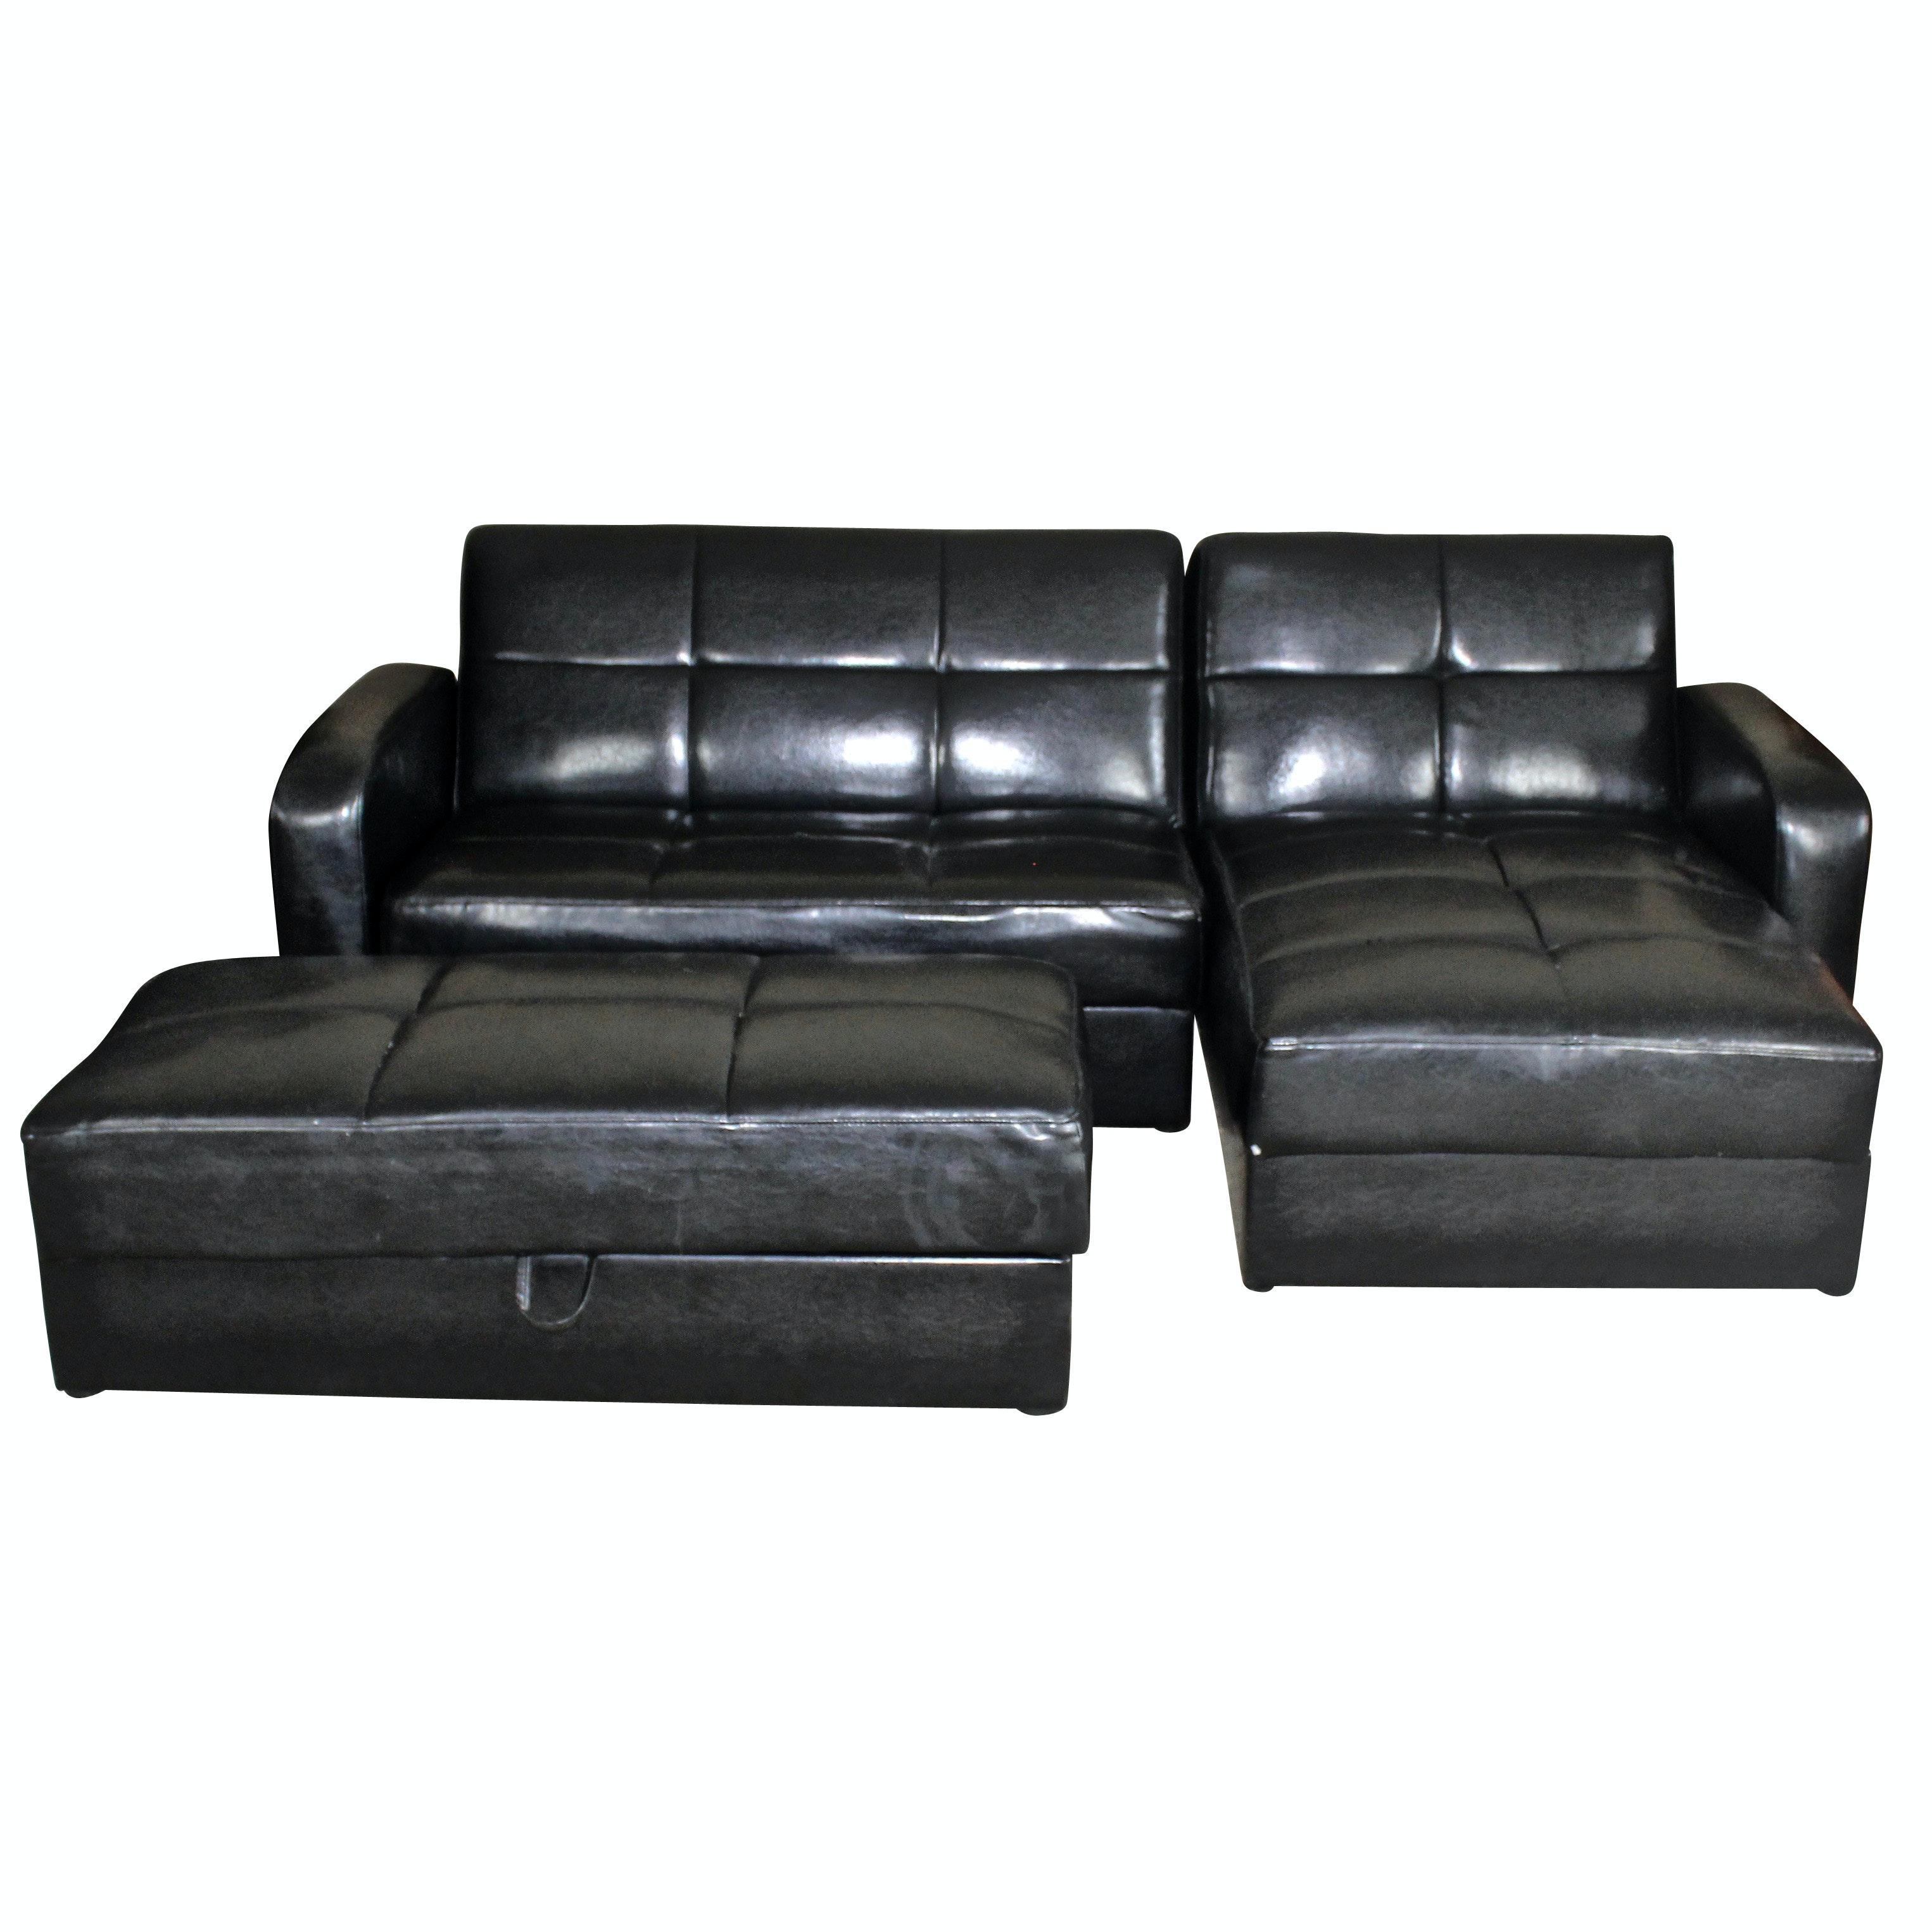 IKEA Storage Sectional Sofa in Black Vinyl